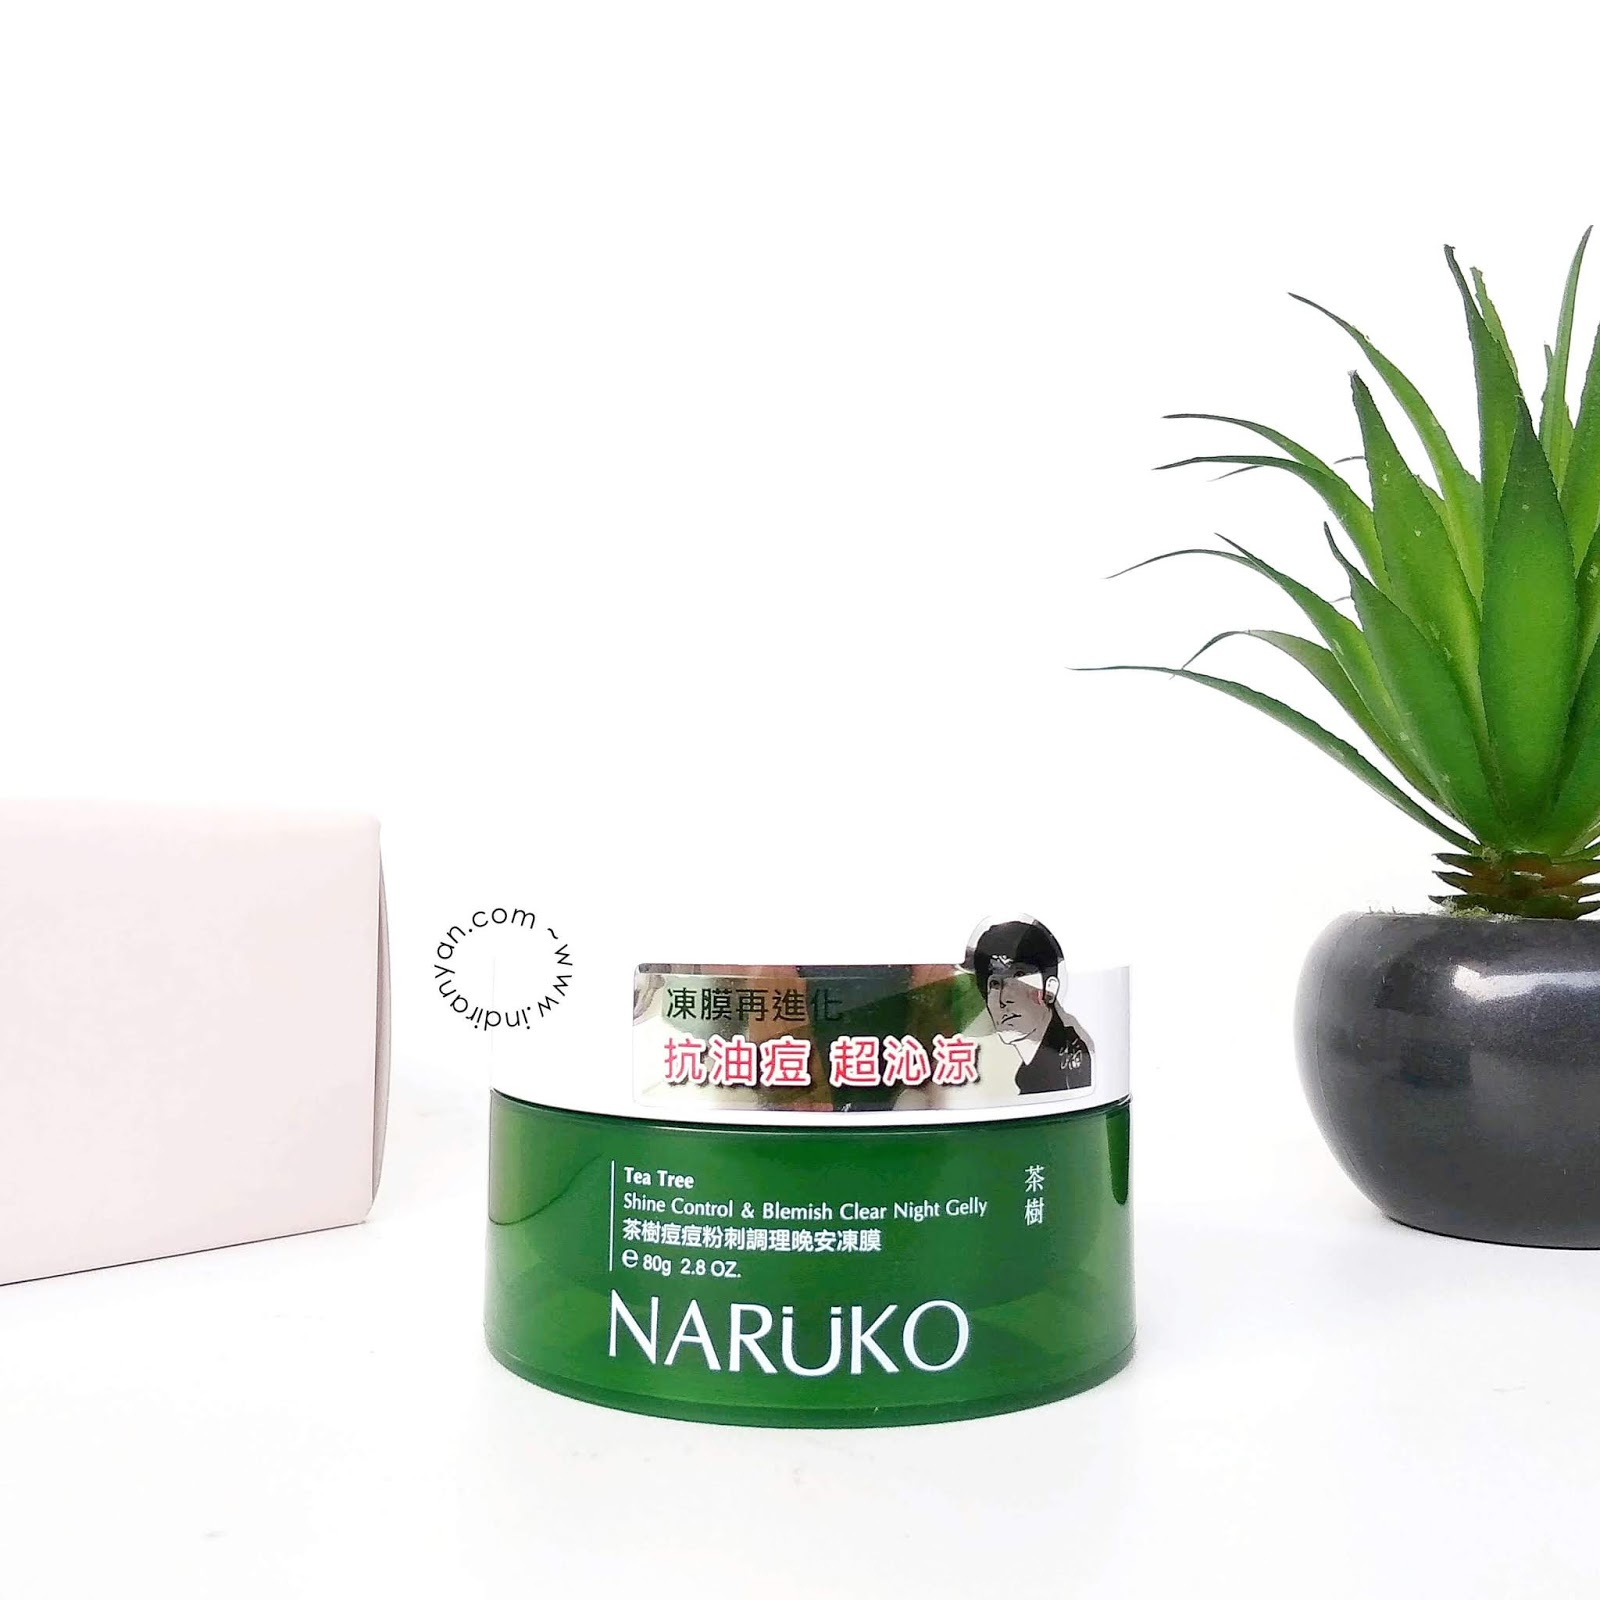 naruko-tea-tre-shine-control-blemish-clear-night-gelly